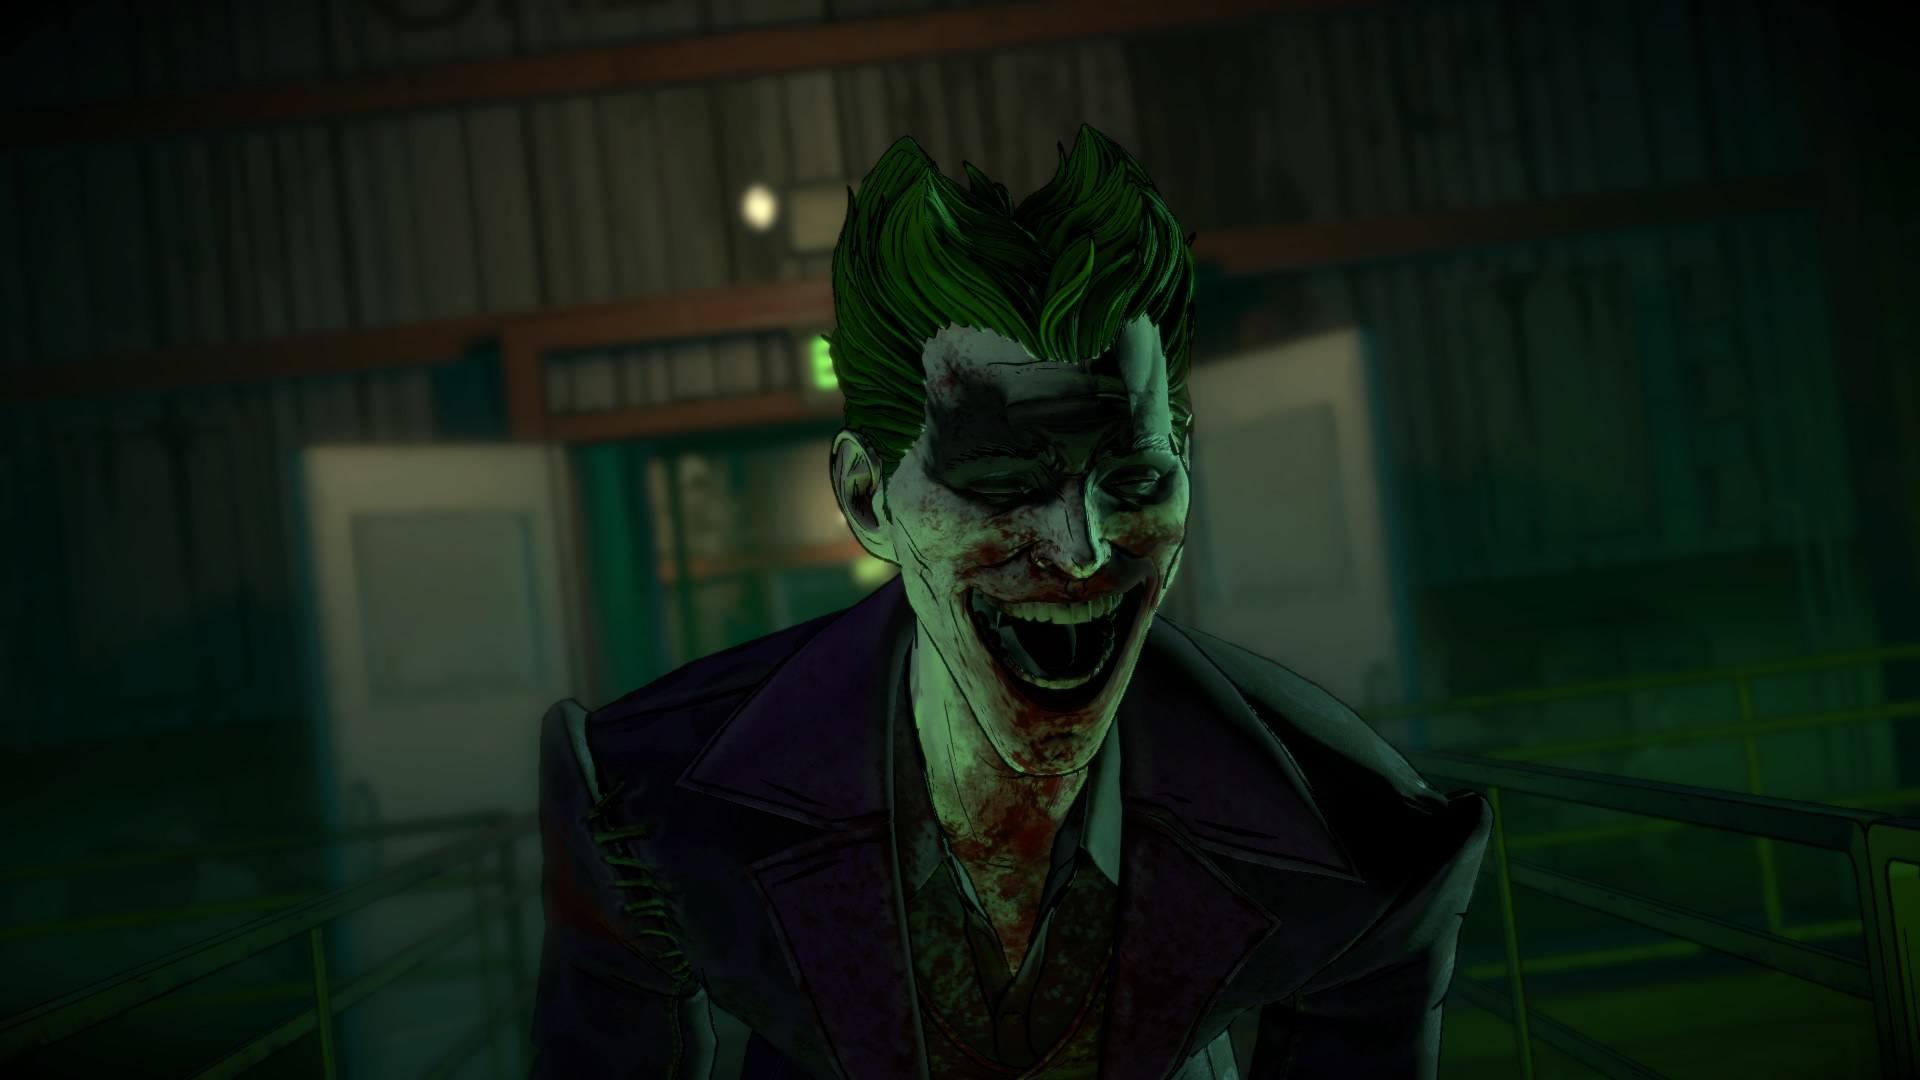 General 1920x1080 Joker PlayStation 4 Batman video games Batman: The Telltale Series